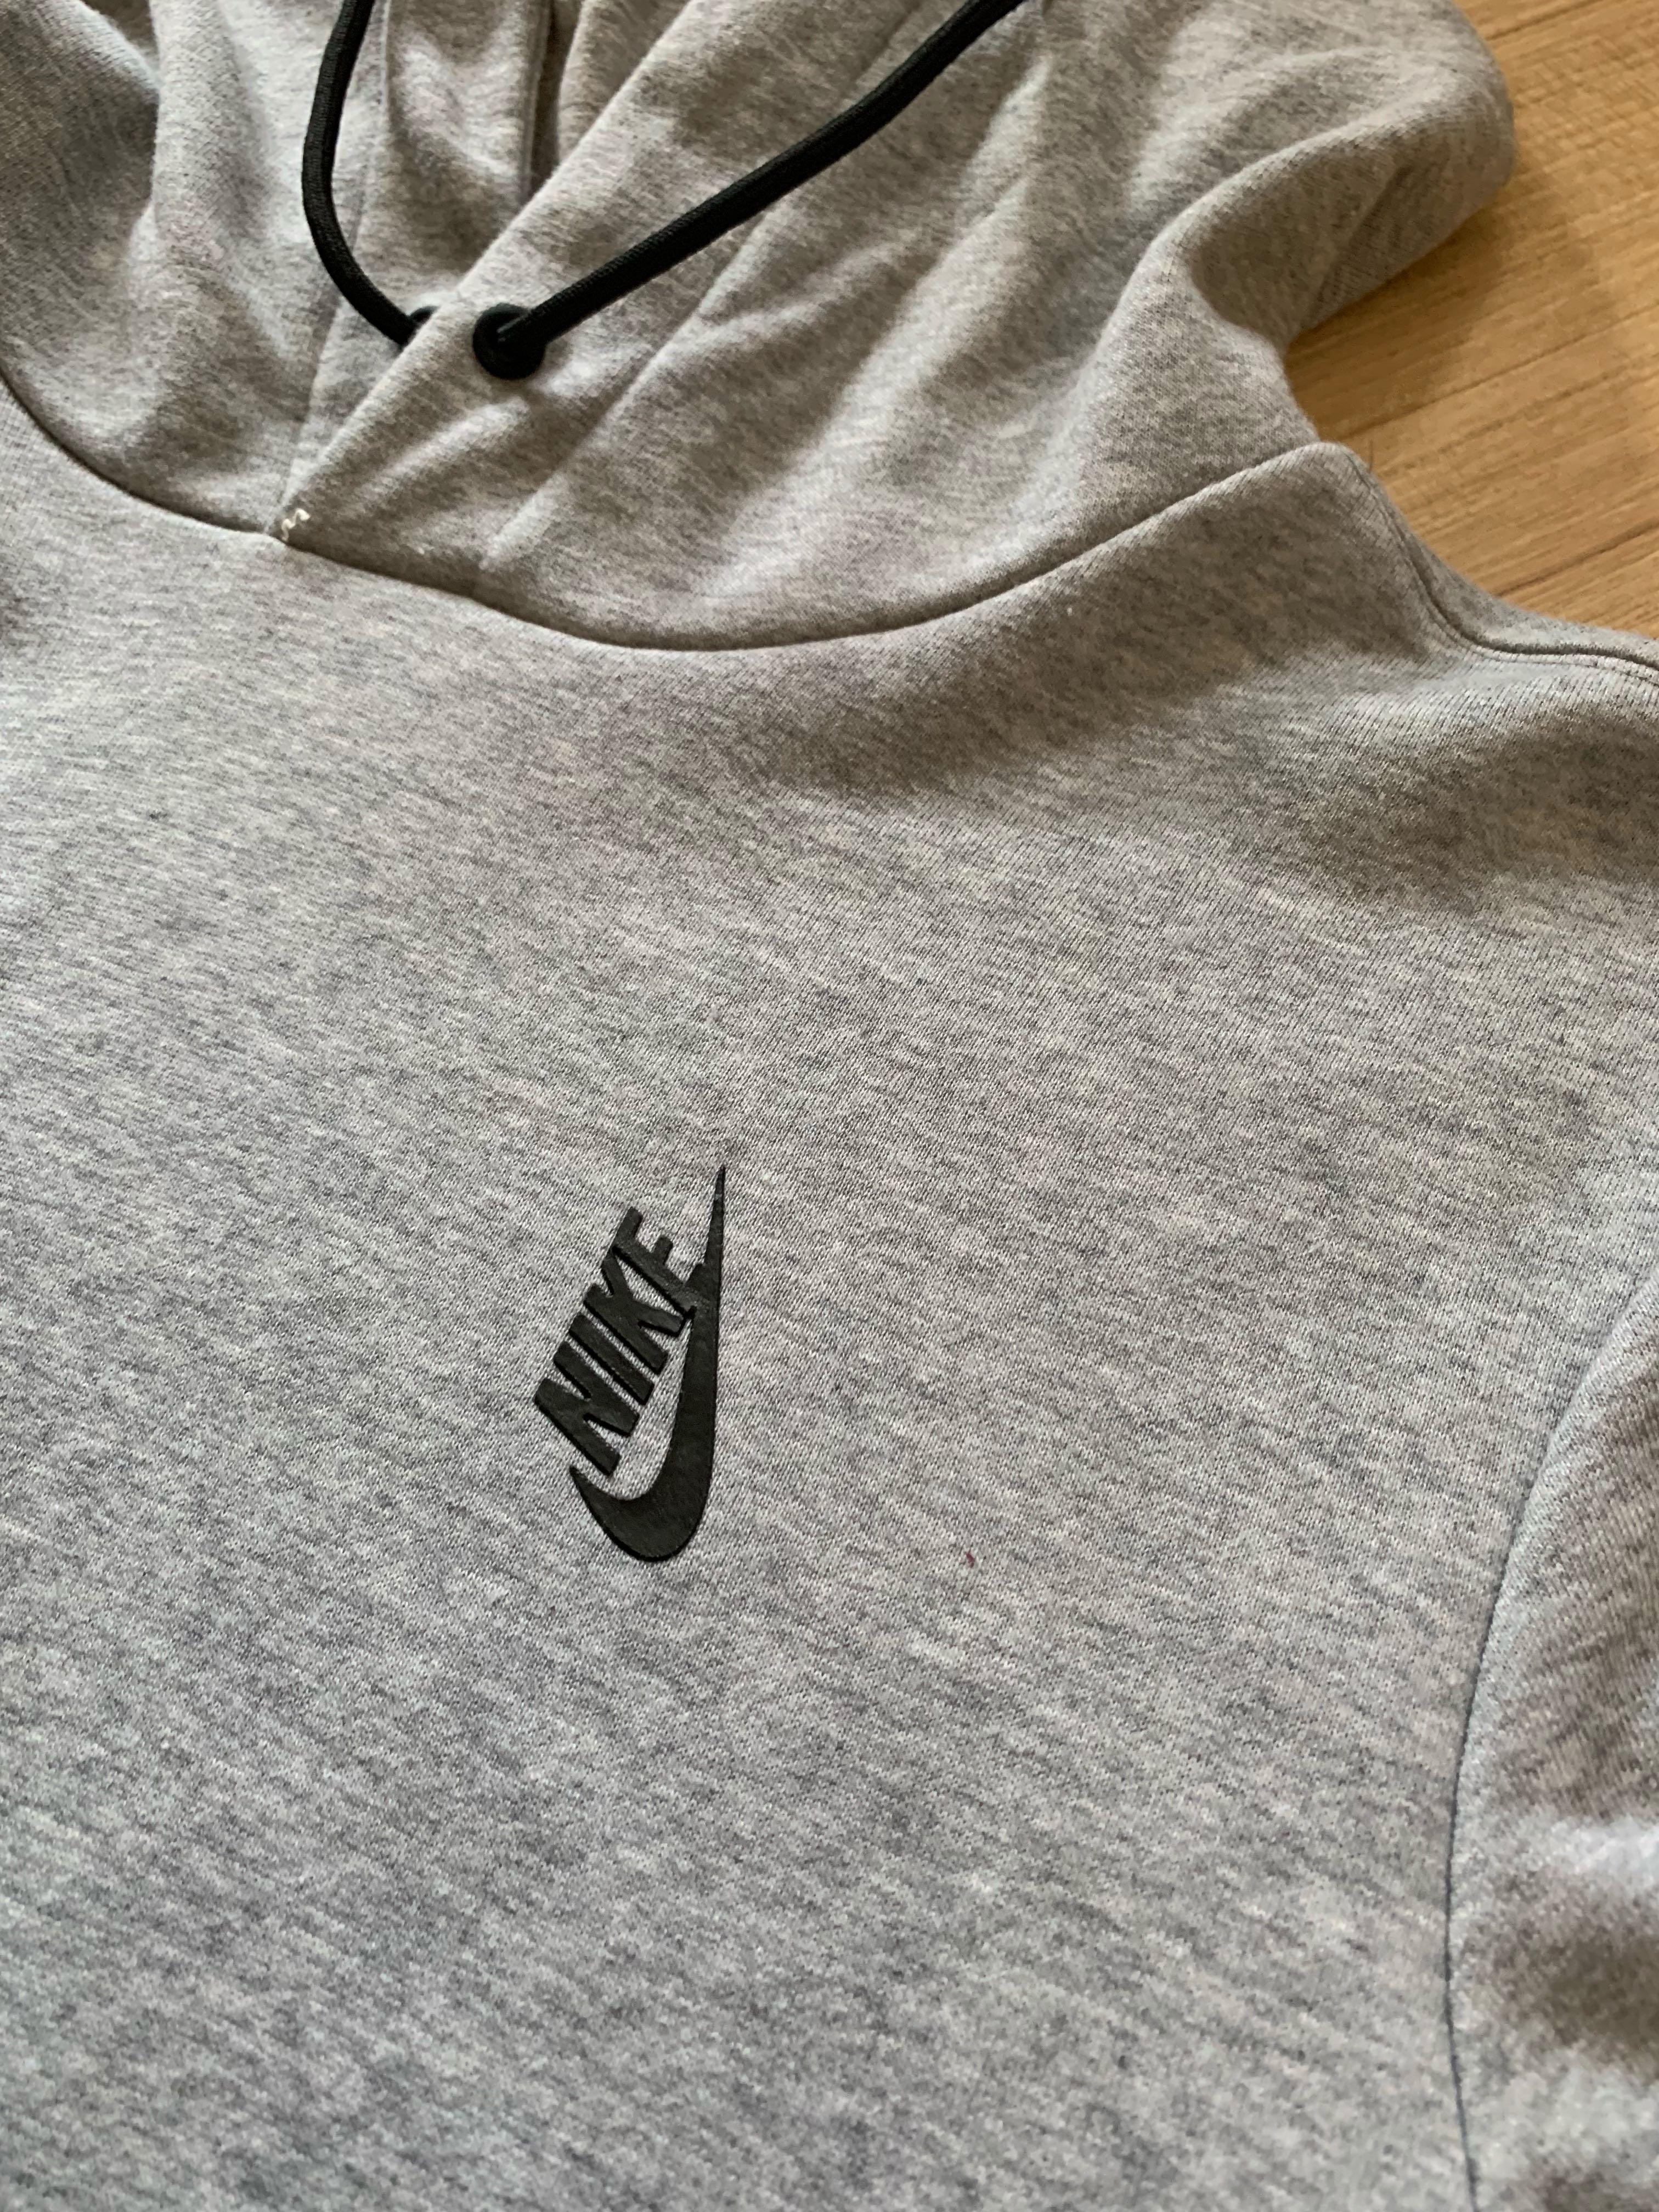 Nike Lab Grey Hoodies Size M